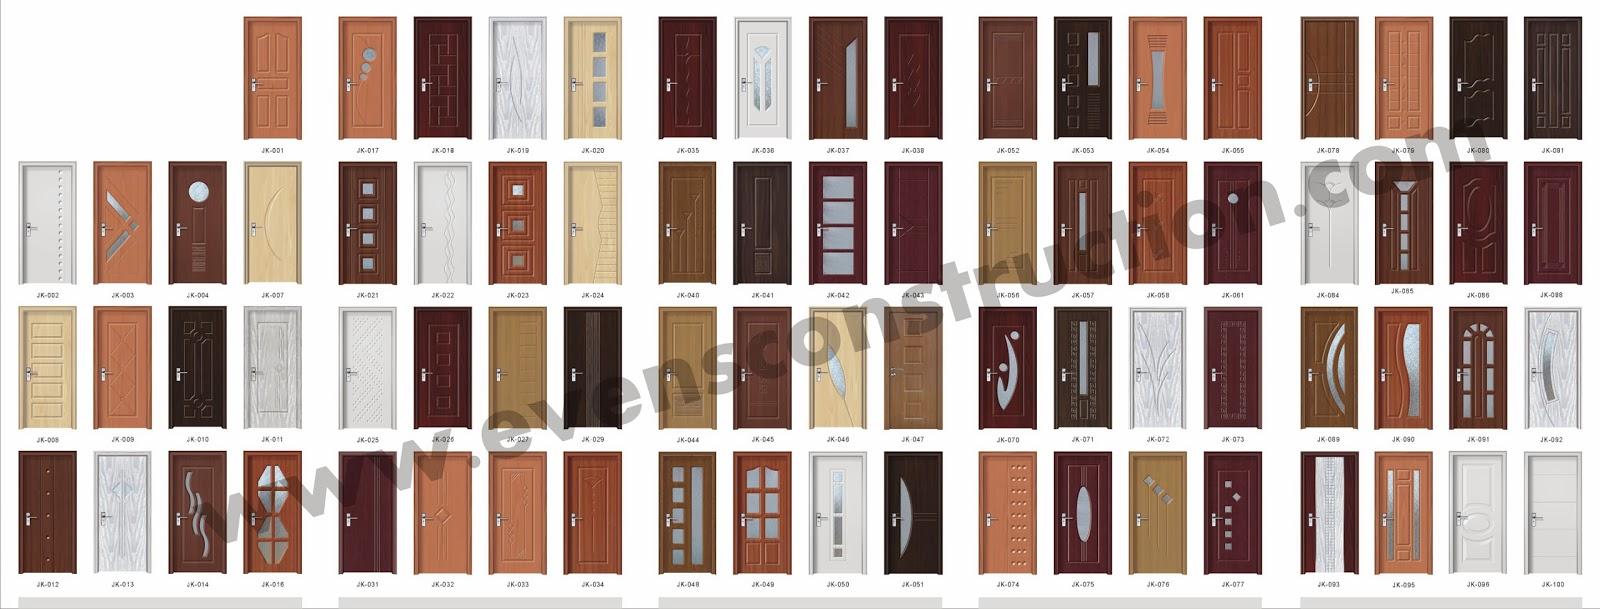 Evens construction pvt ltd doors for Commercial interior doors